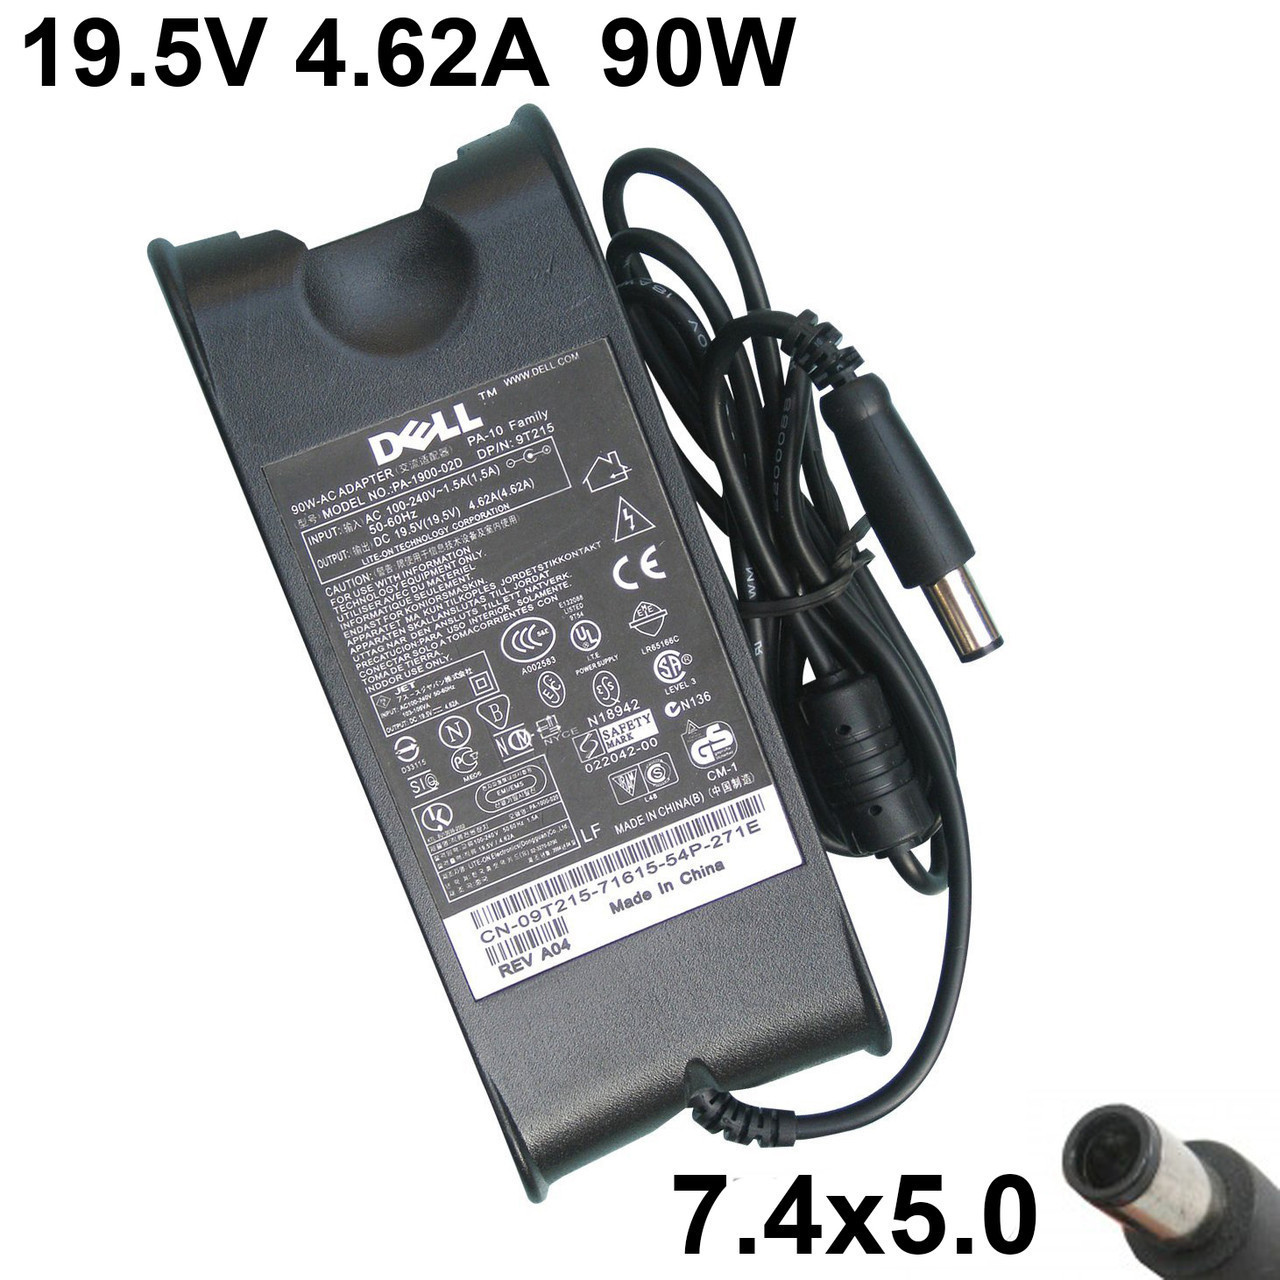 Блок питания для ноутбука зарядное устройство Dell Inspiron 1564, 1564D, 1564R, 1570, 15z, 1720